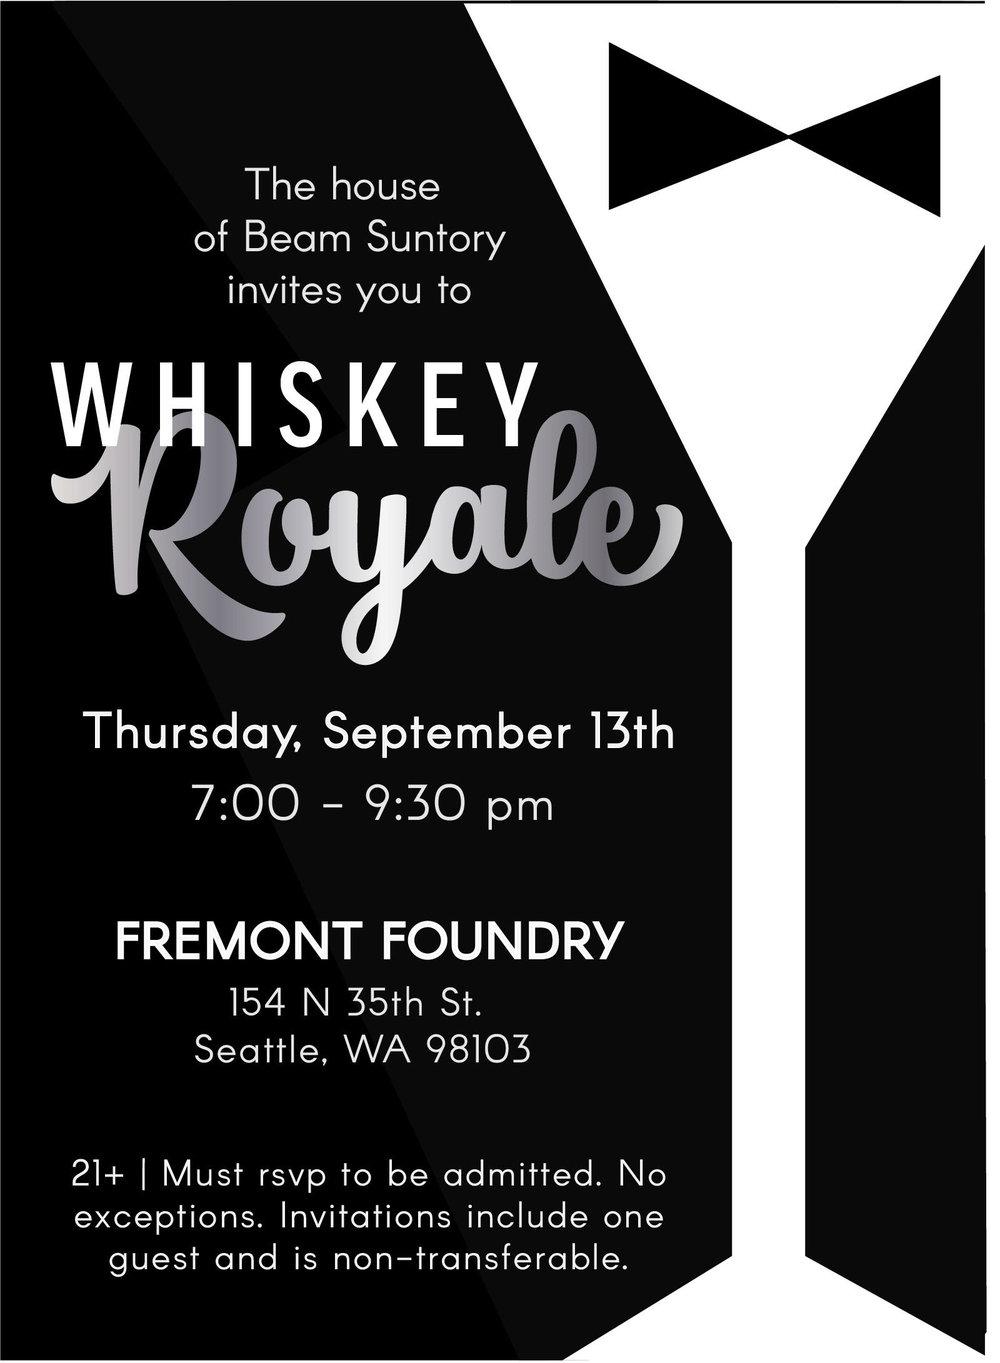 dff.whiskey-royale-invite-print.jpg